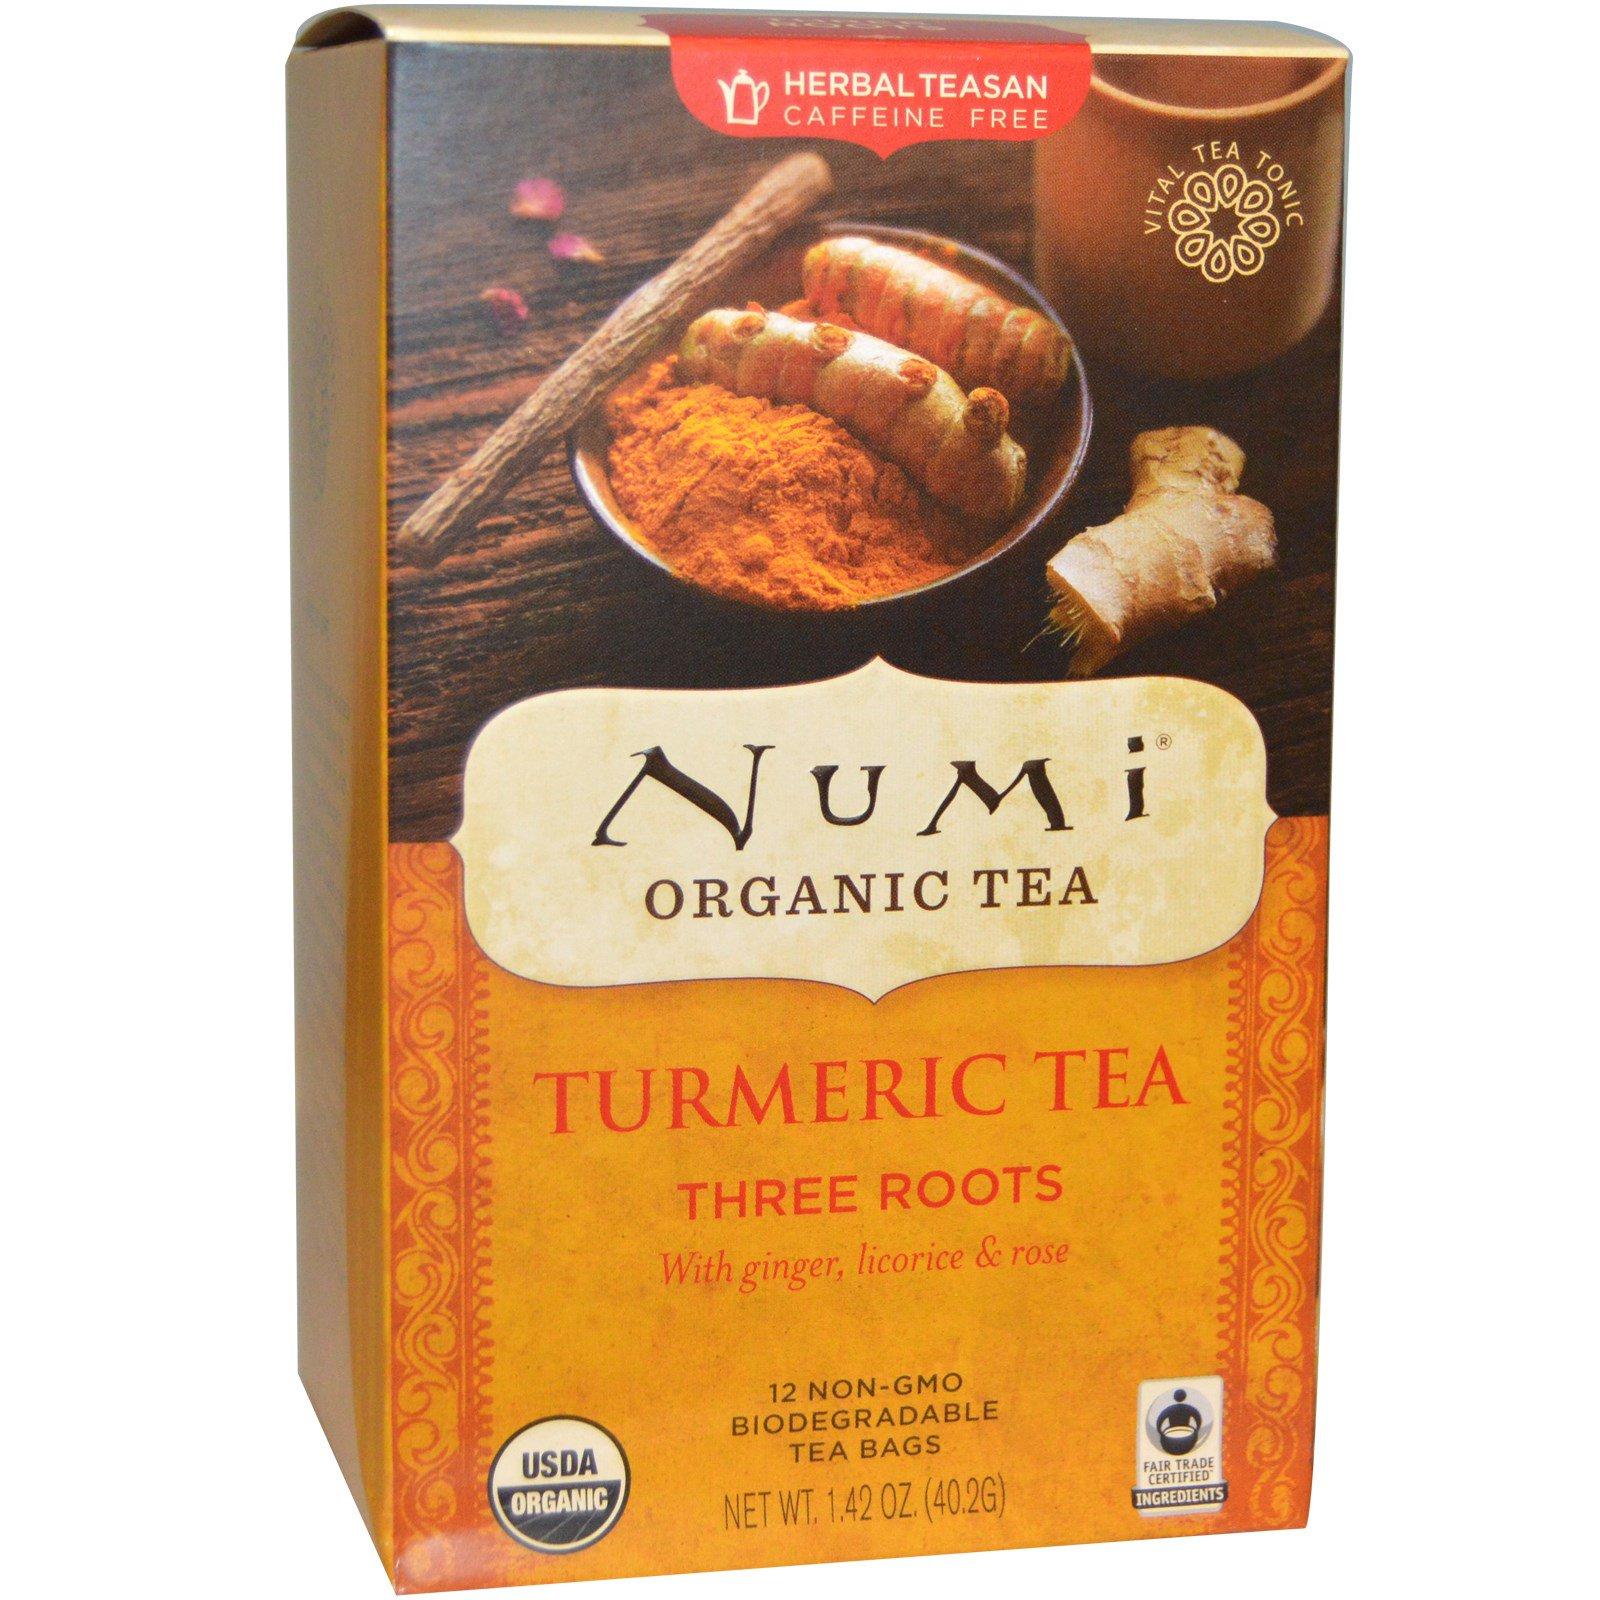 Numi Tea, Organic, Turmeric Tea, Three Roots, 12 Tea Bags, 1.42 oz (40.2 g)